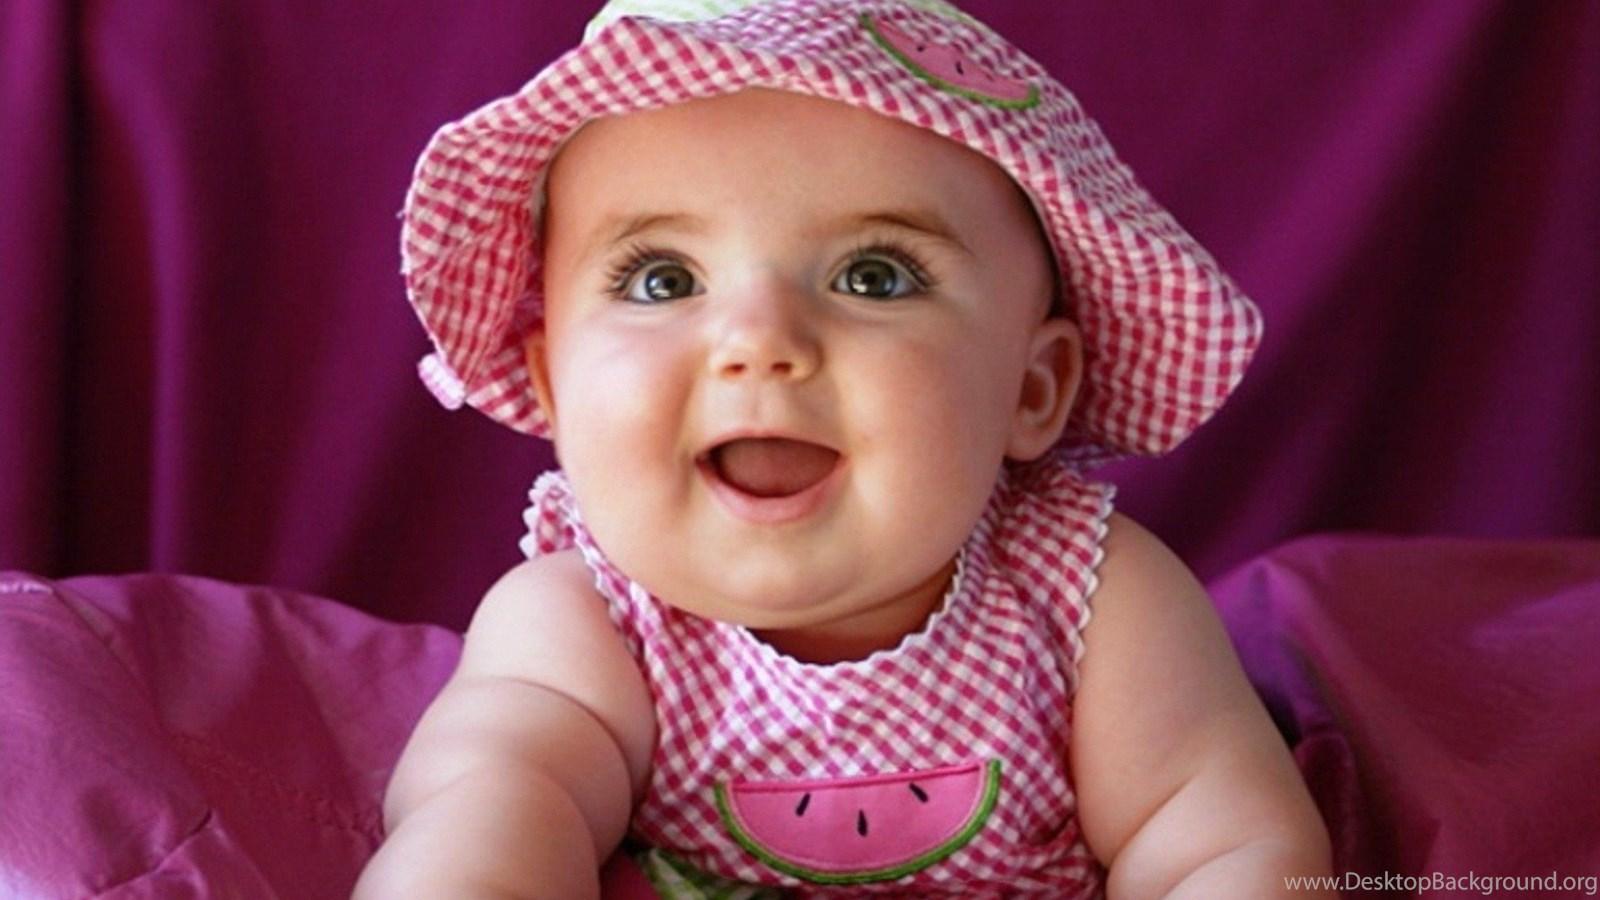 Cute Little Babies Hq 2 Wallpapers: Cute Baby Girl Wallpapers Facebook Desktop Background